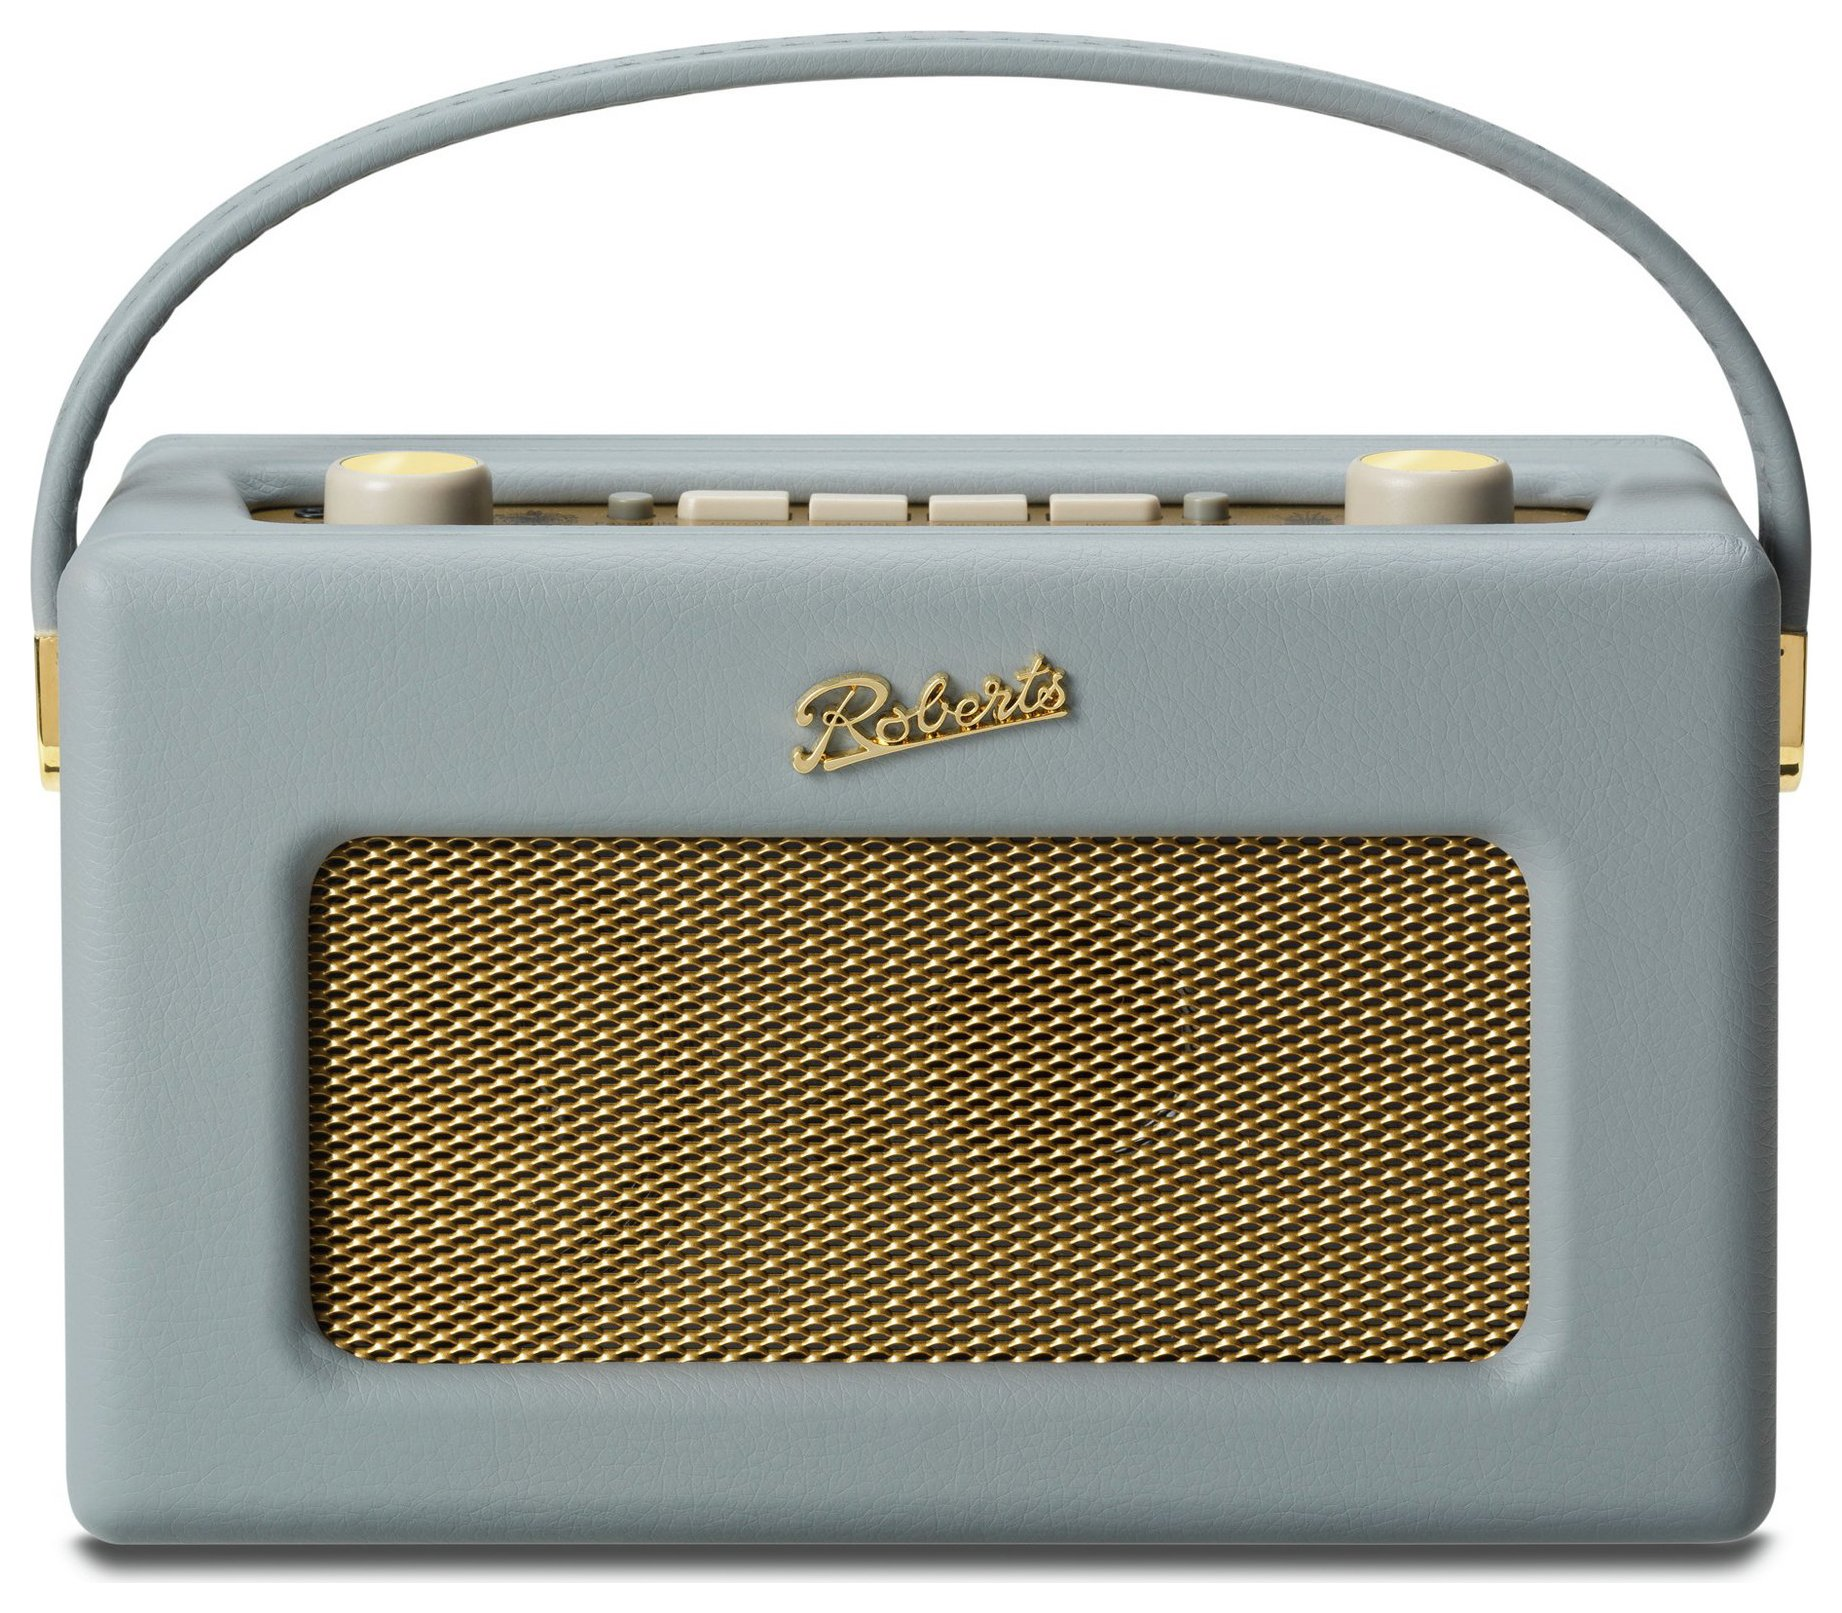 Roberts Roberts - Revival DAB Radio - Dove Grey